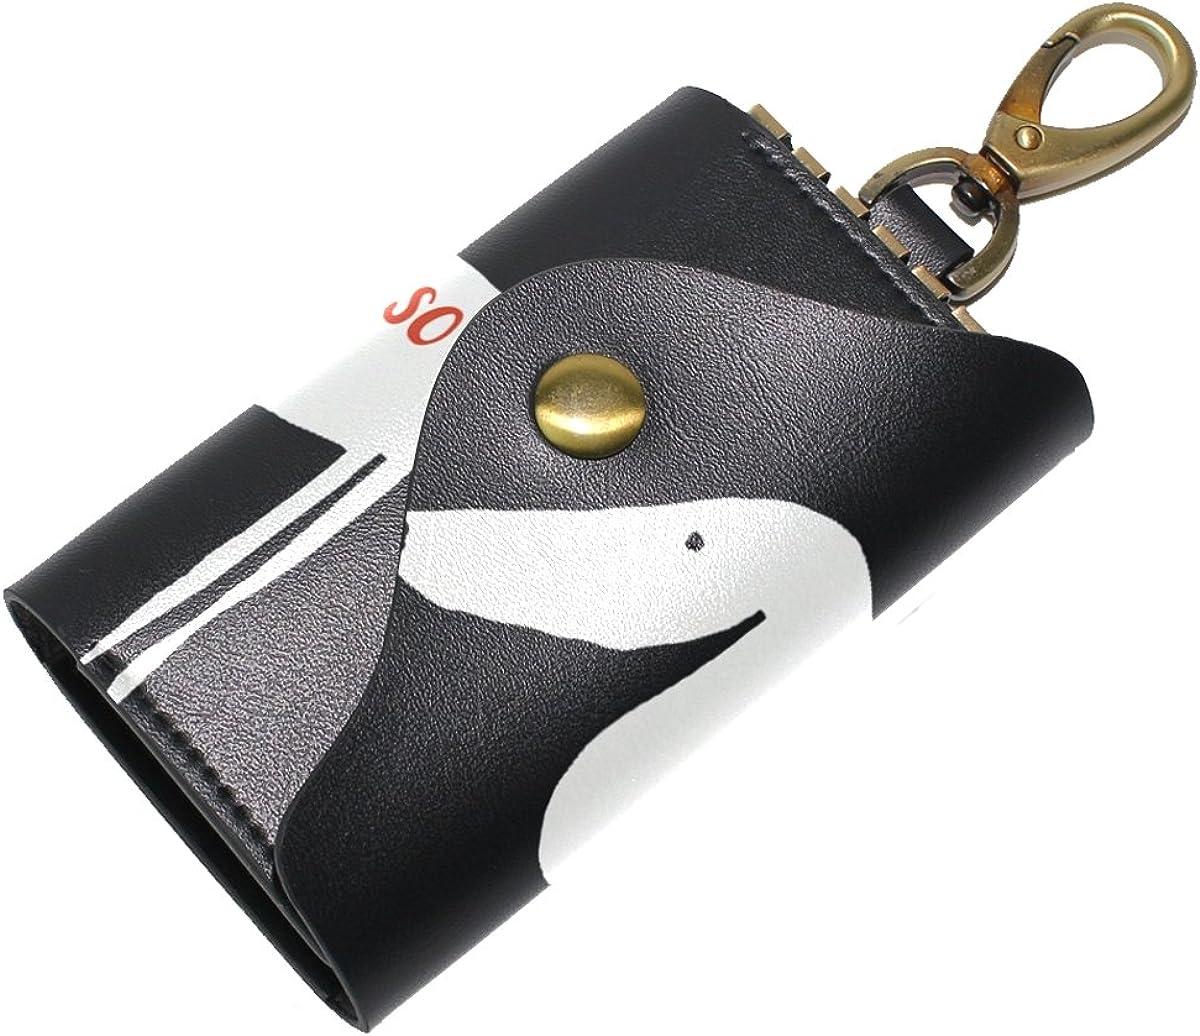 DEYYA Vanesa Casuso Dachshund Dog Leather Key Case Wallets Unisex Keychain Key Holder with 6 Hooks Snap Closure